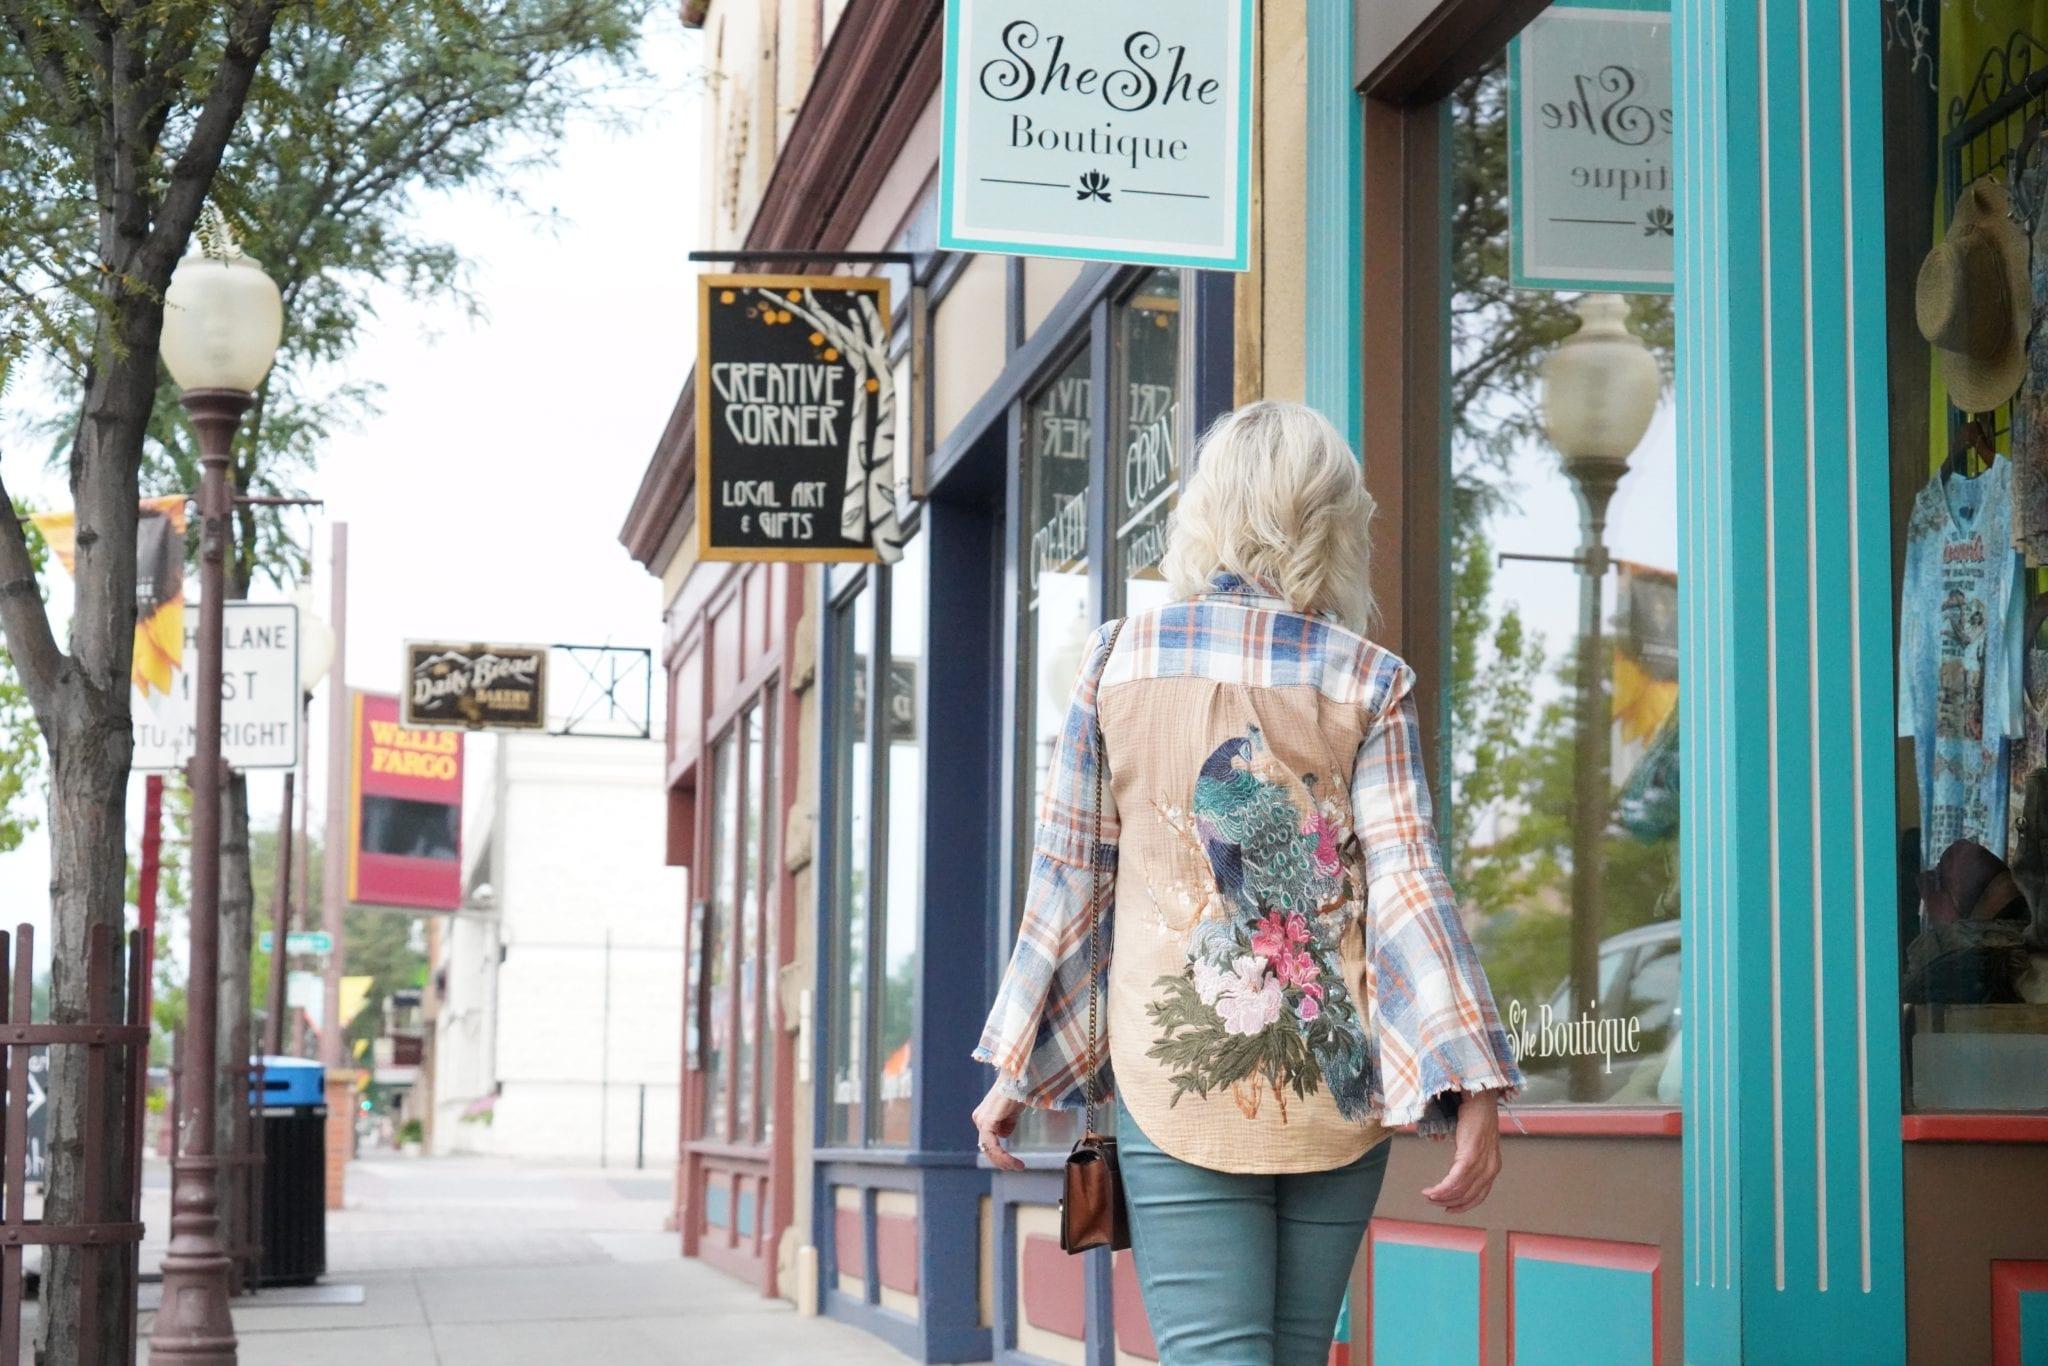 Floral shirts, plaid shirts, mixing patterns, print shirts, fall tops